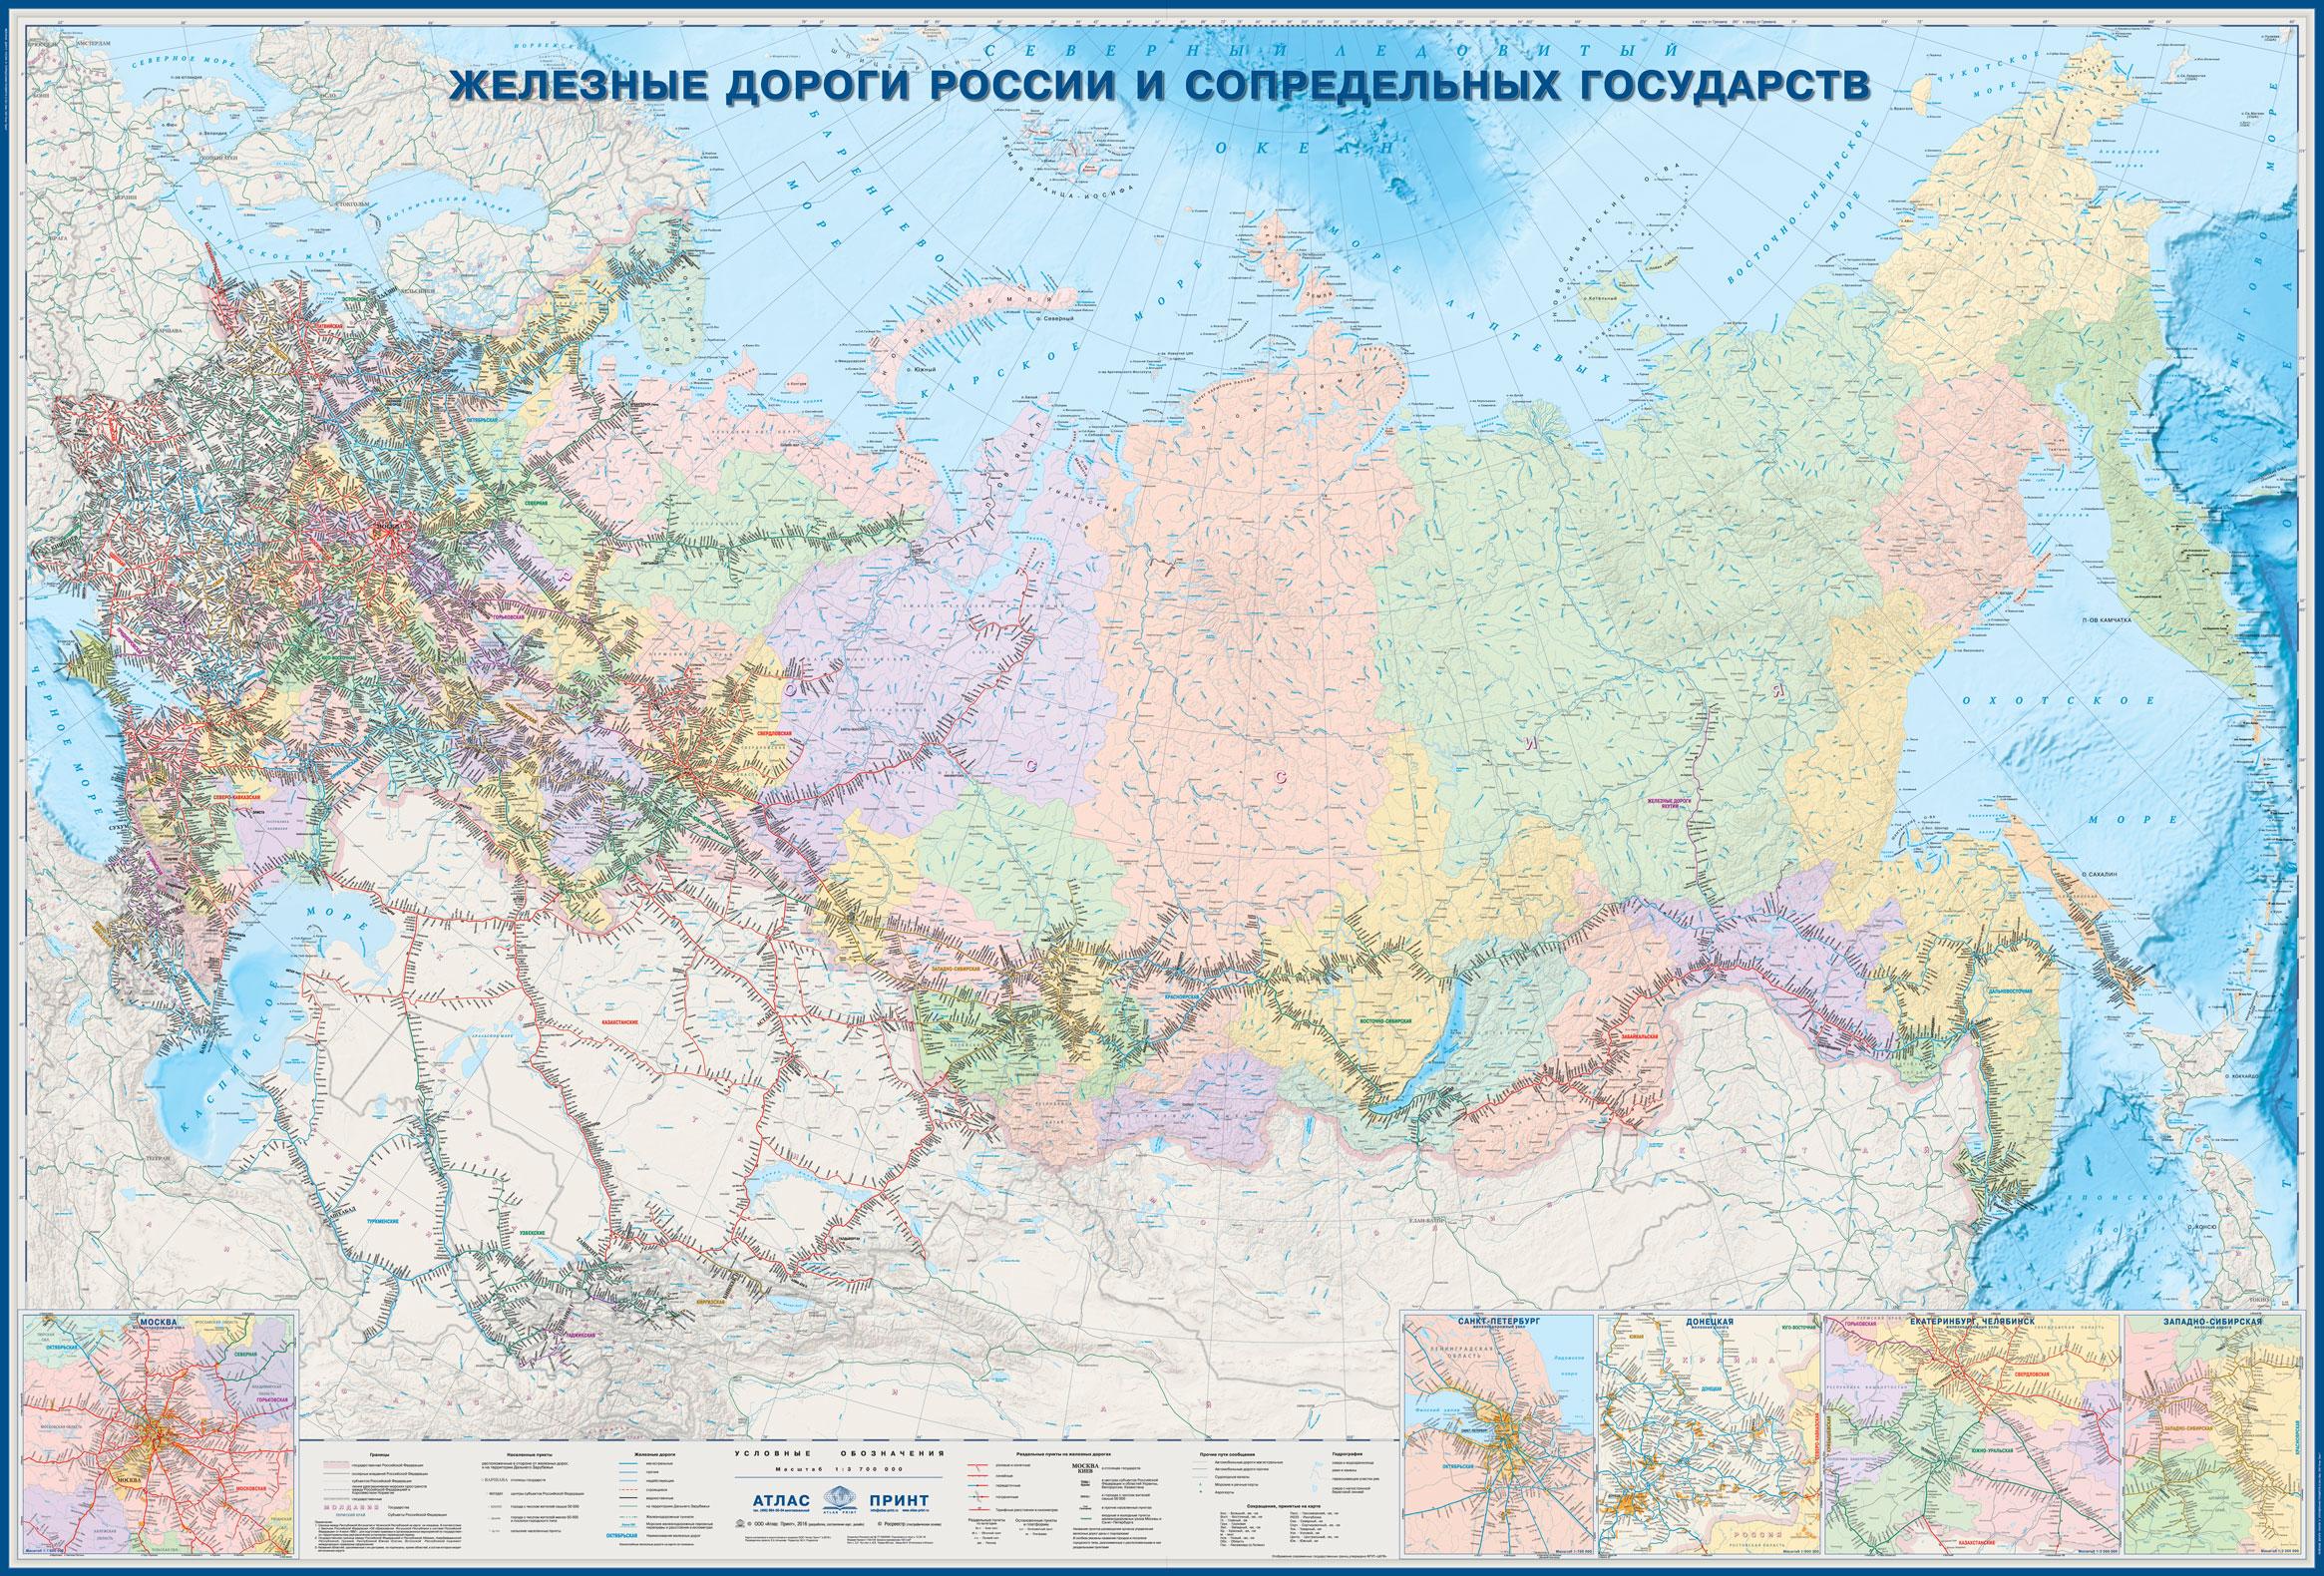 Схема ж.д дорог россии